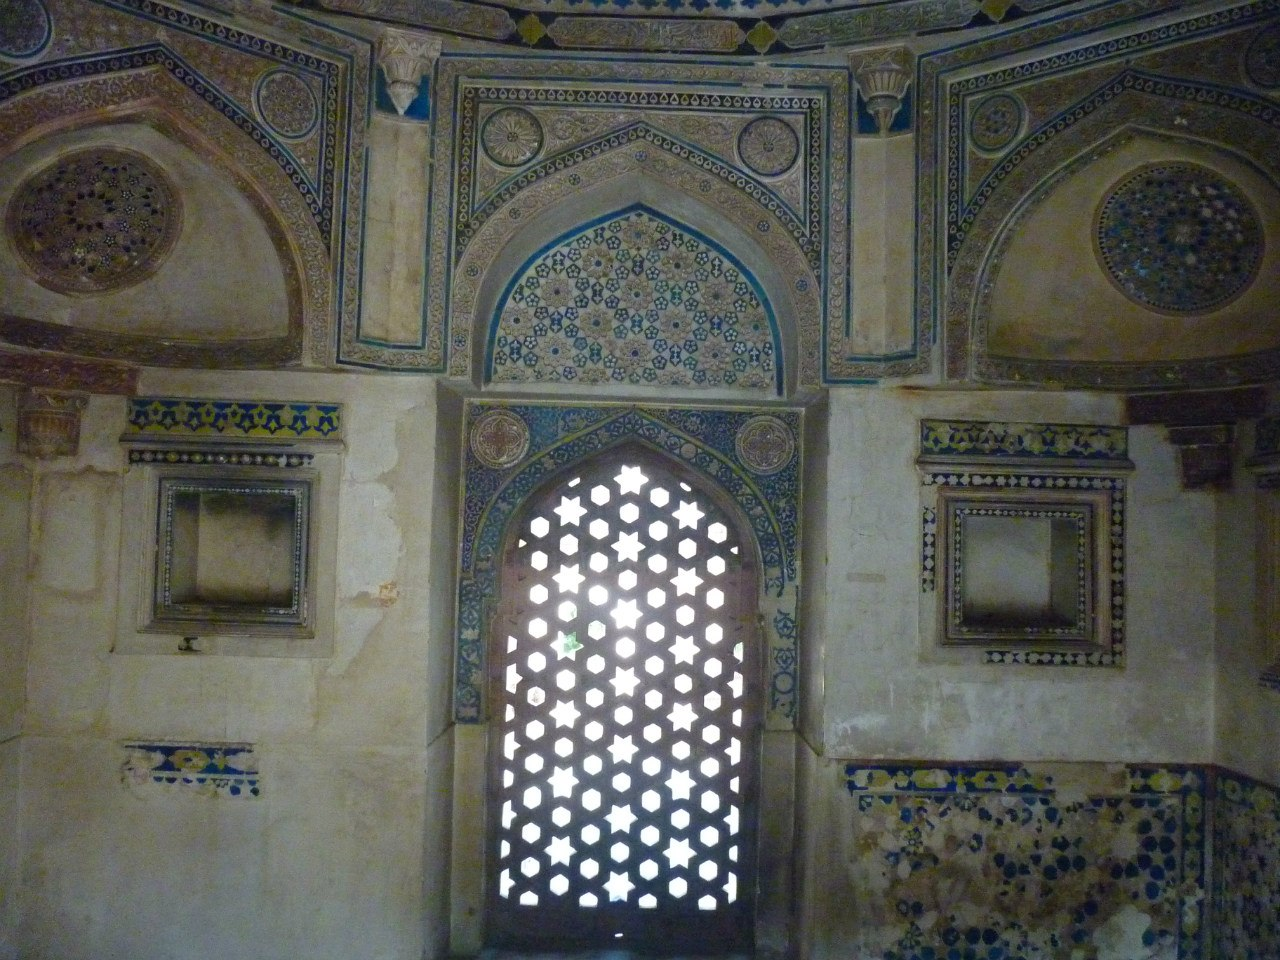 Индия. Дели. Гробница Джамали Камали